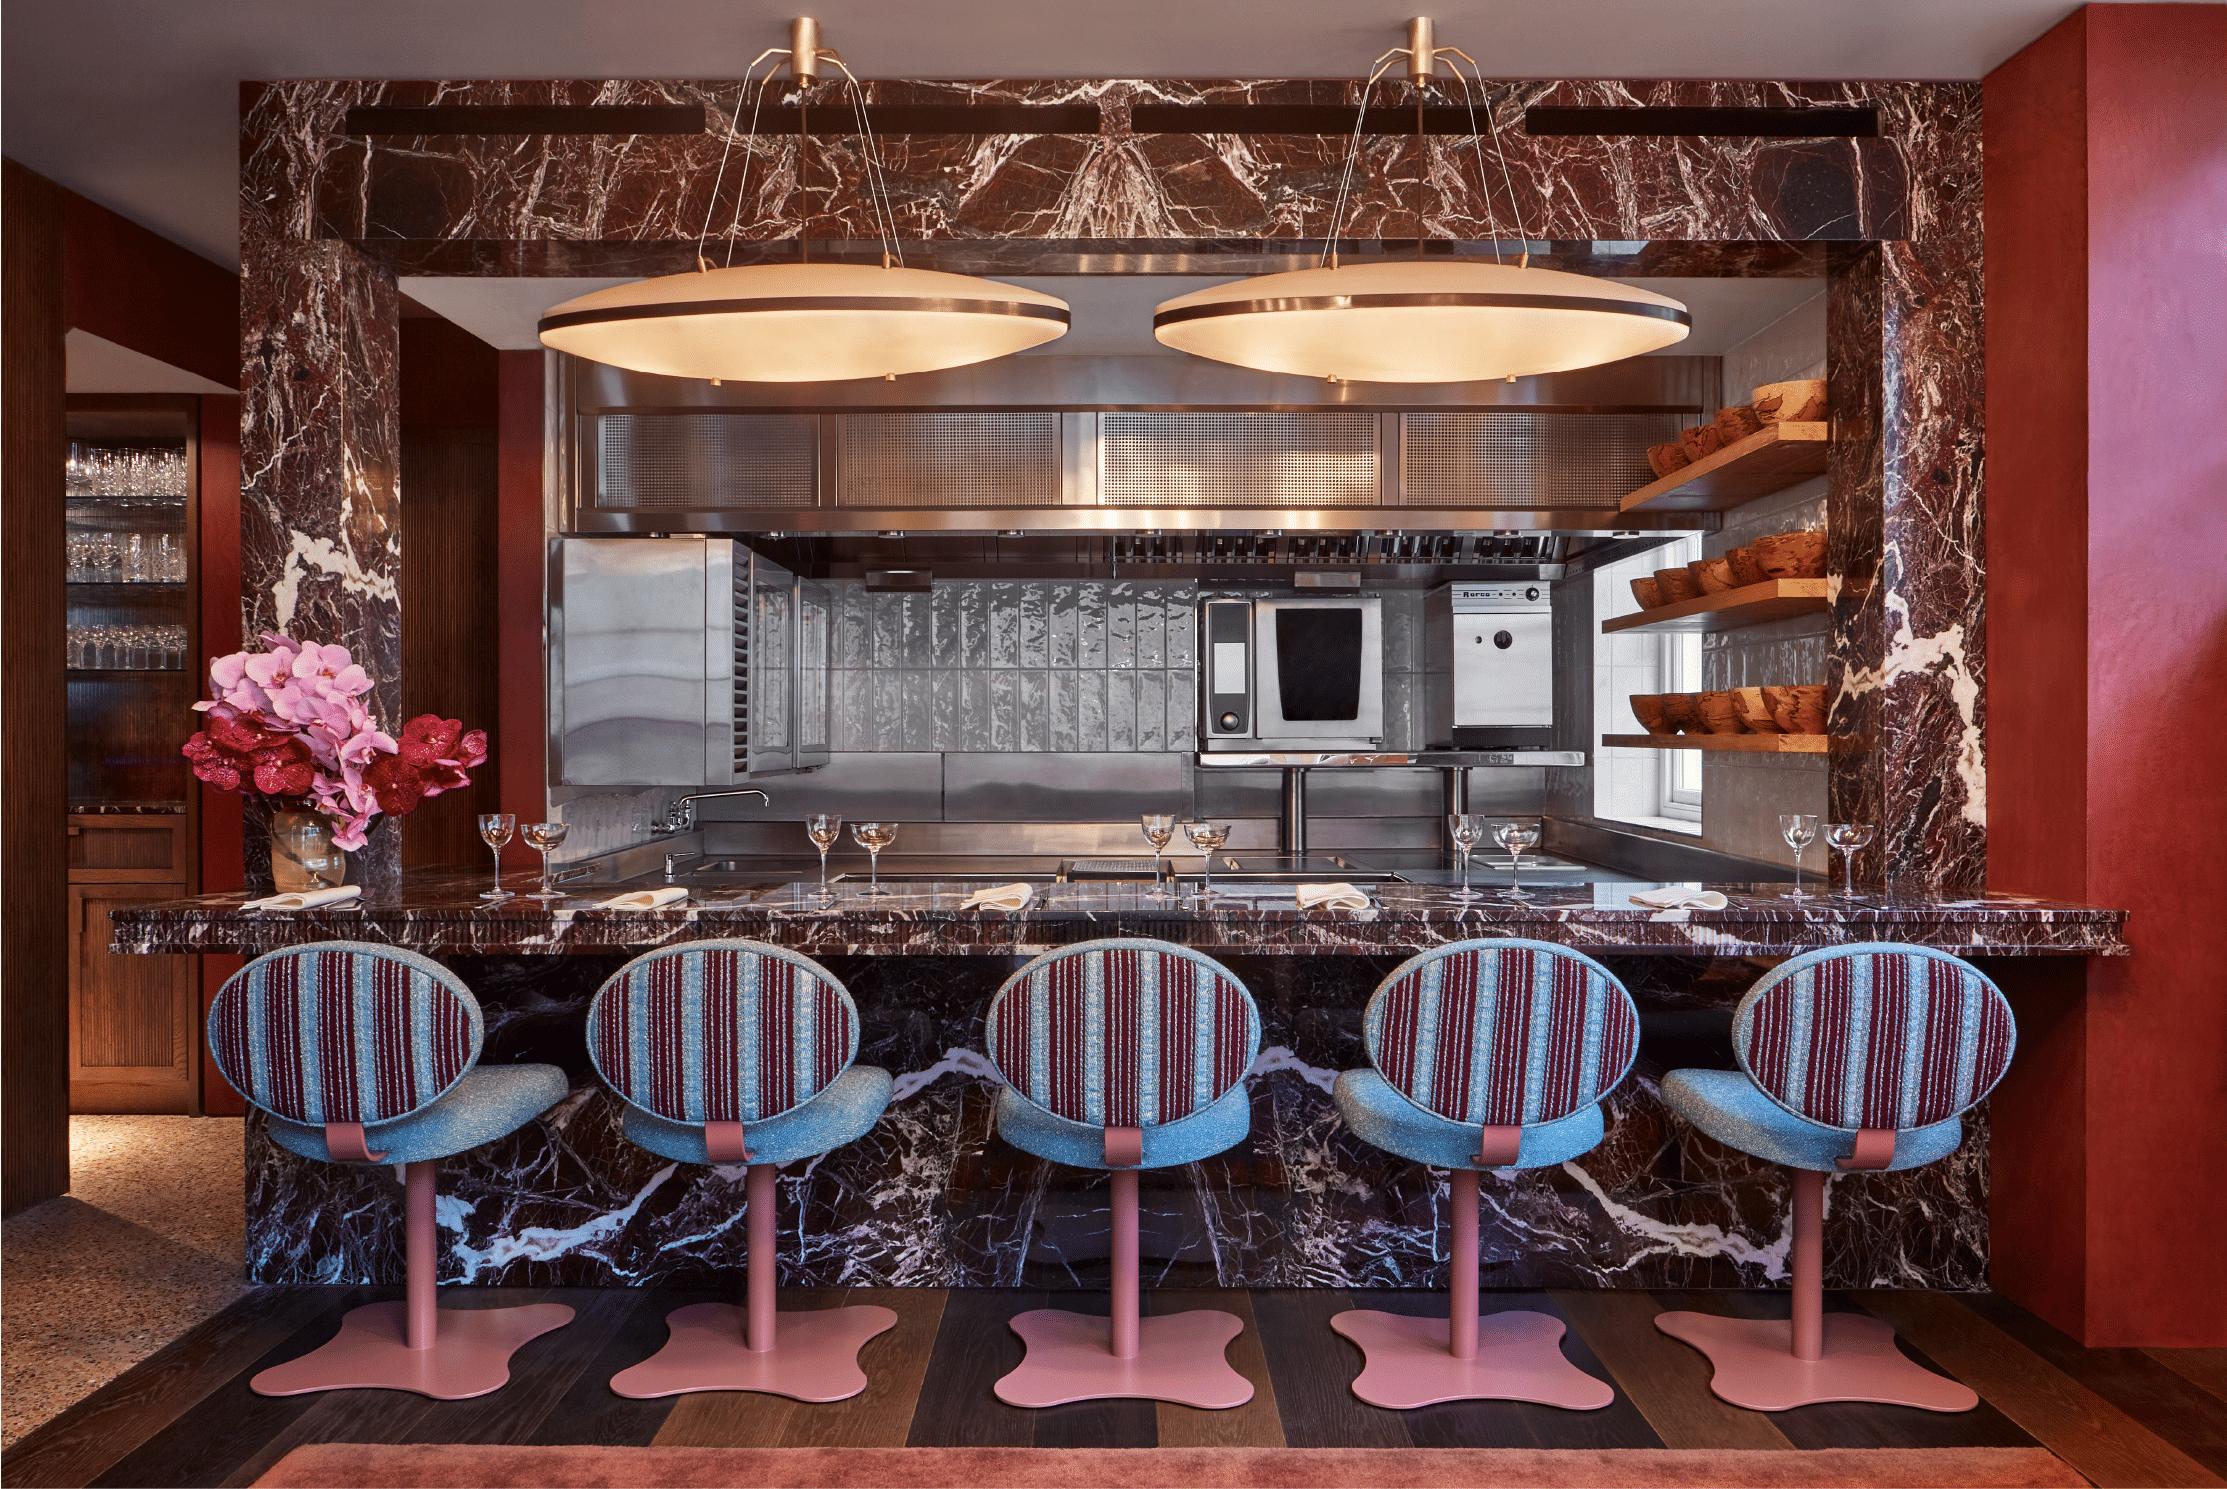 muse new michelin star restaurant london